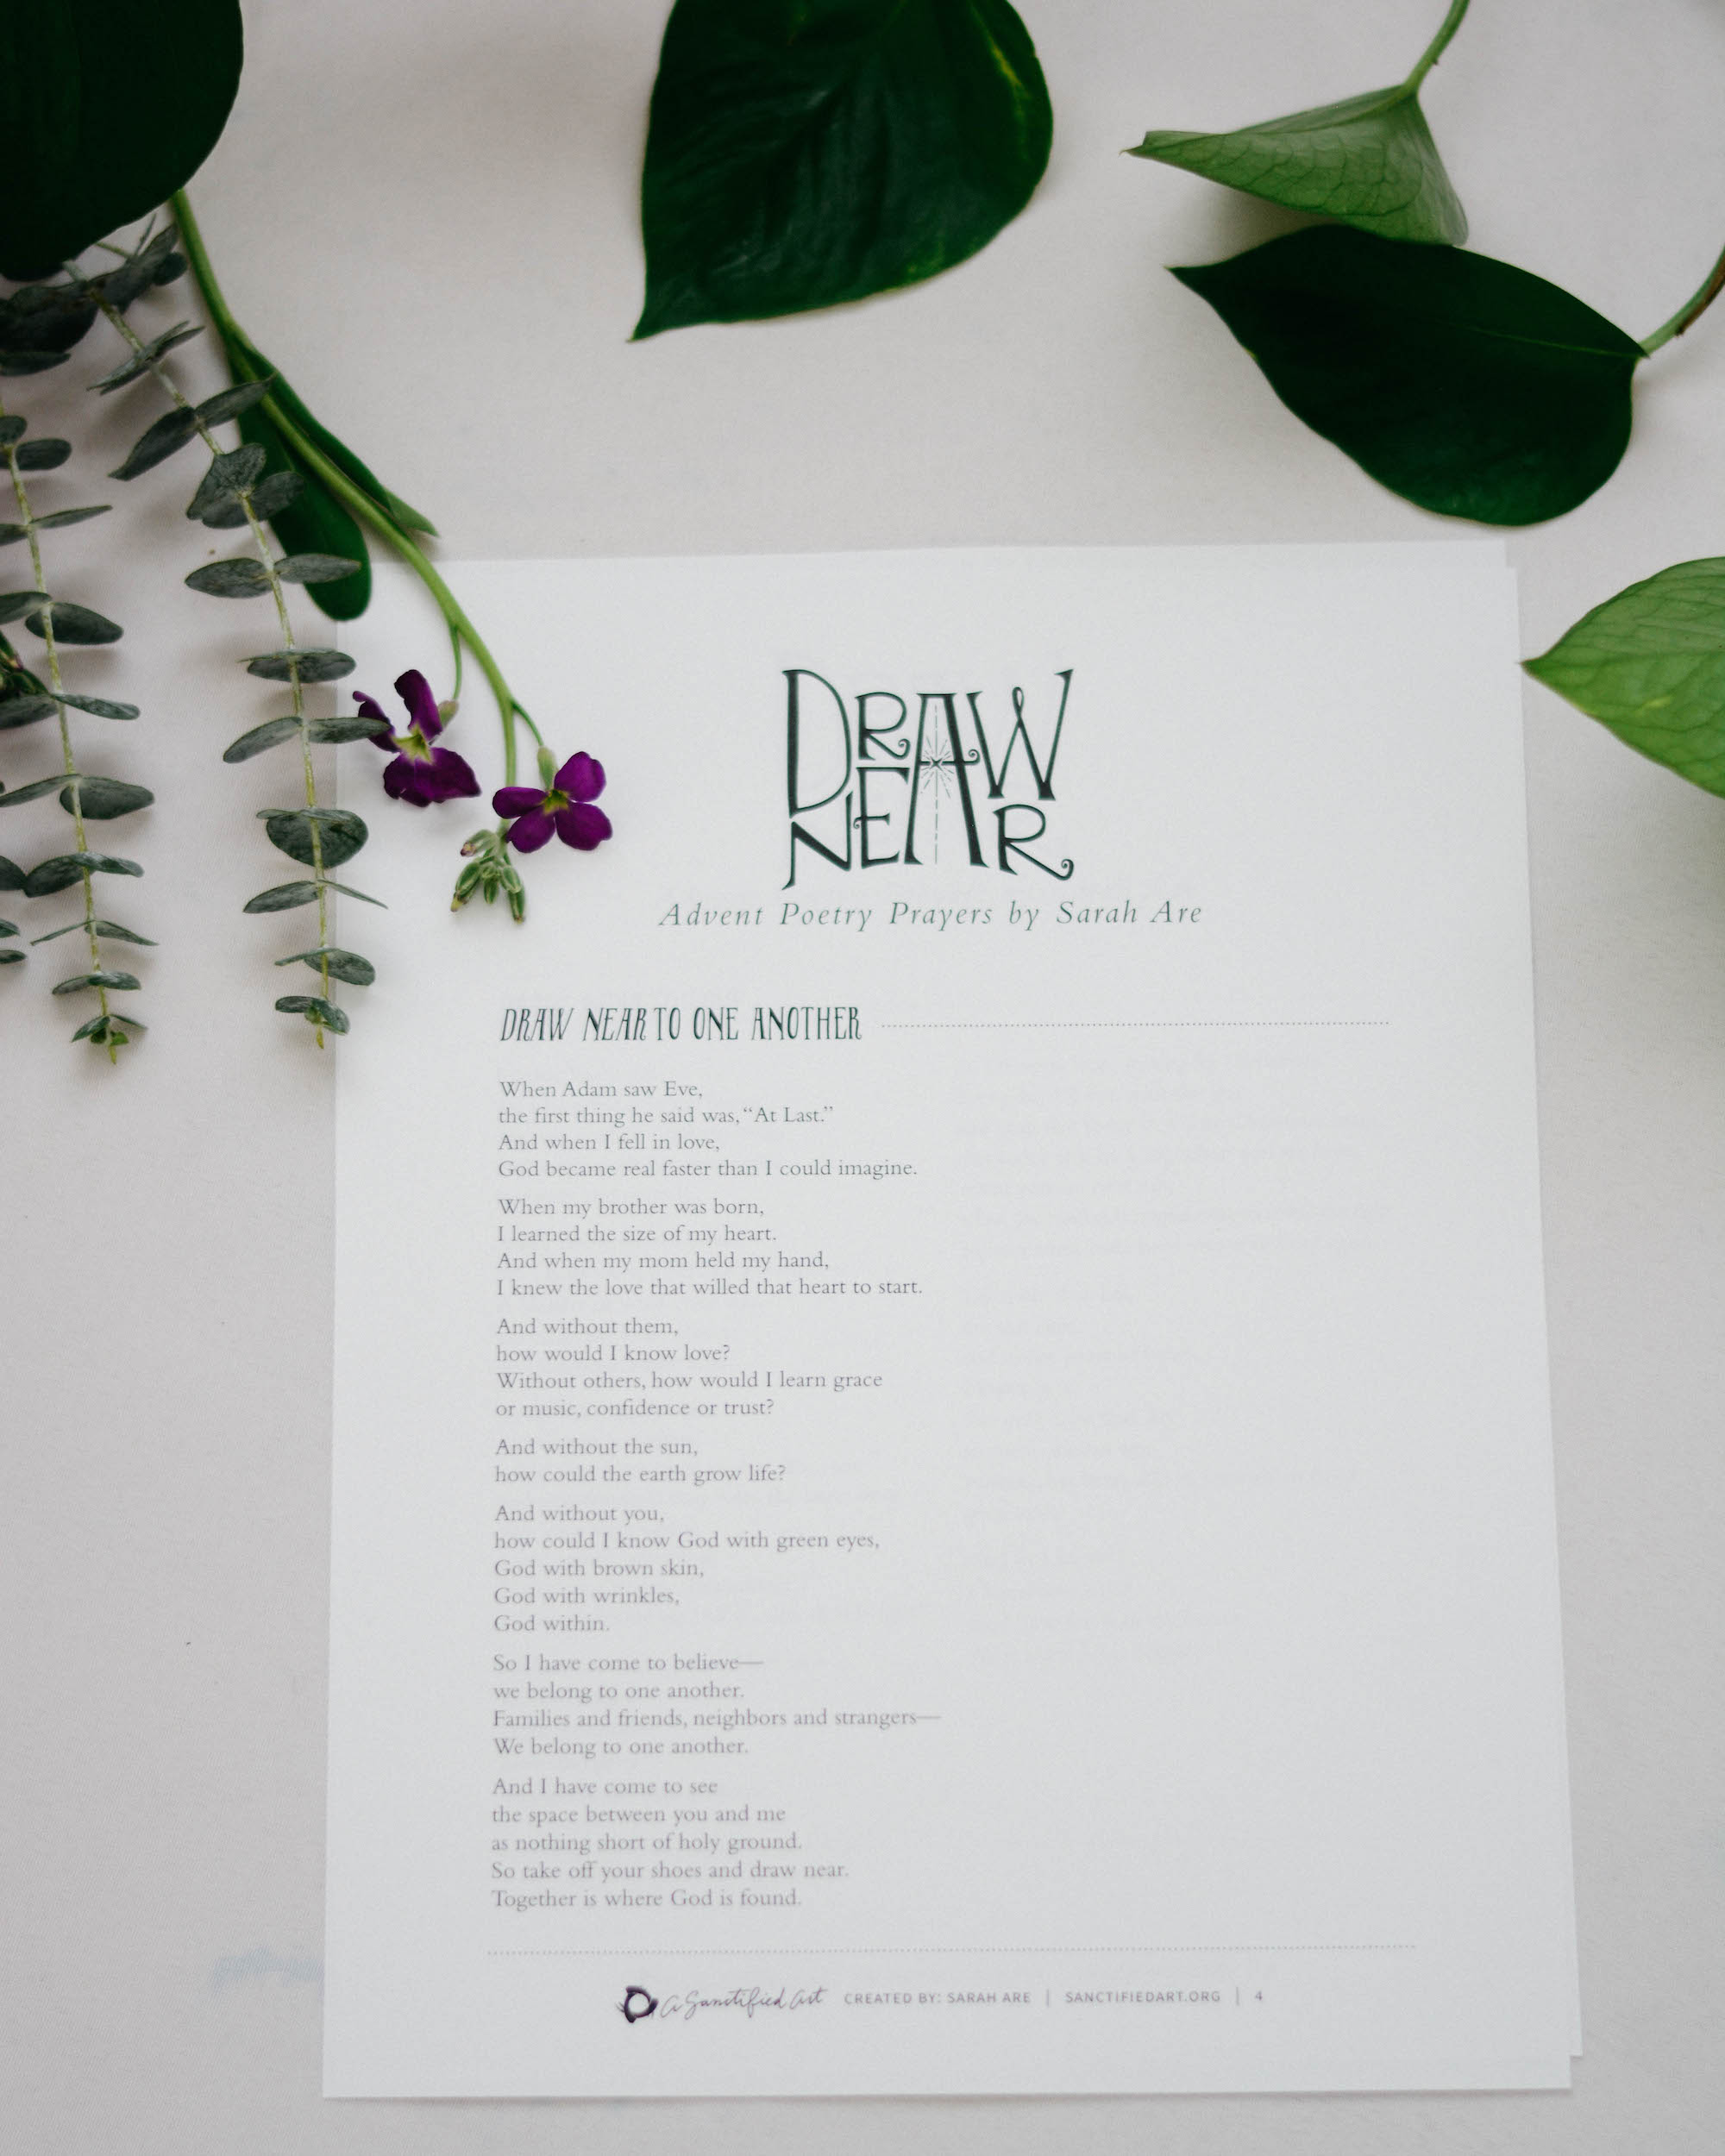 draw_near_poetry_prayers-5.jpg